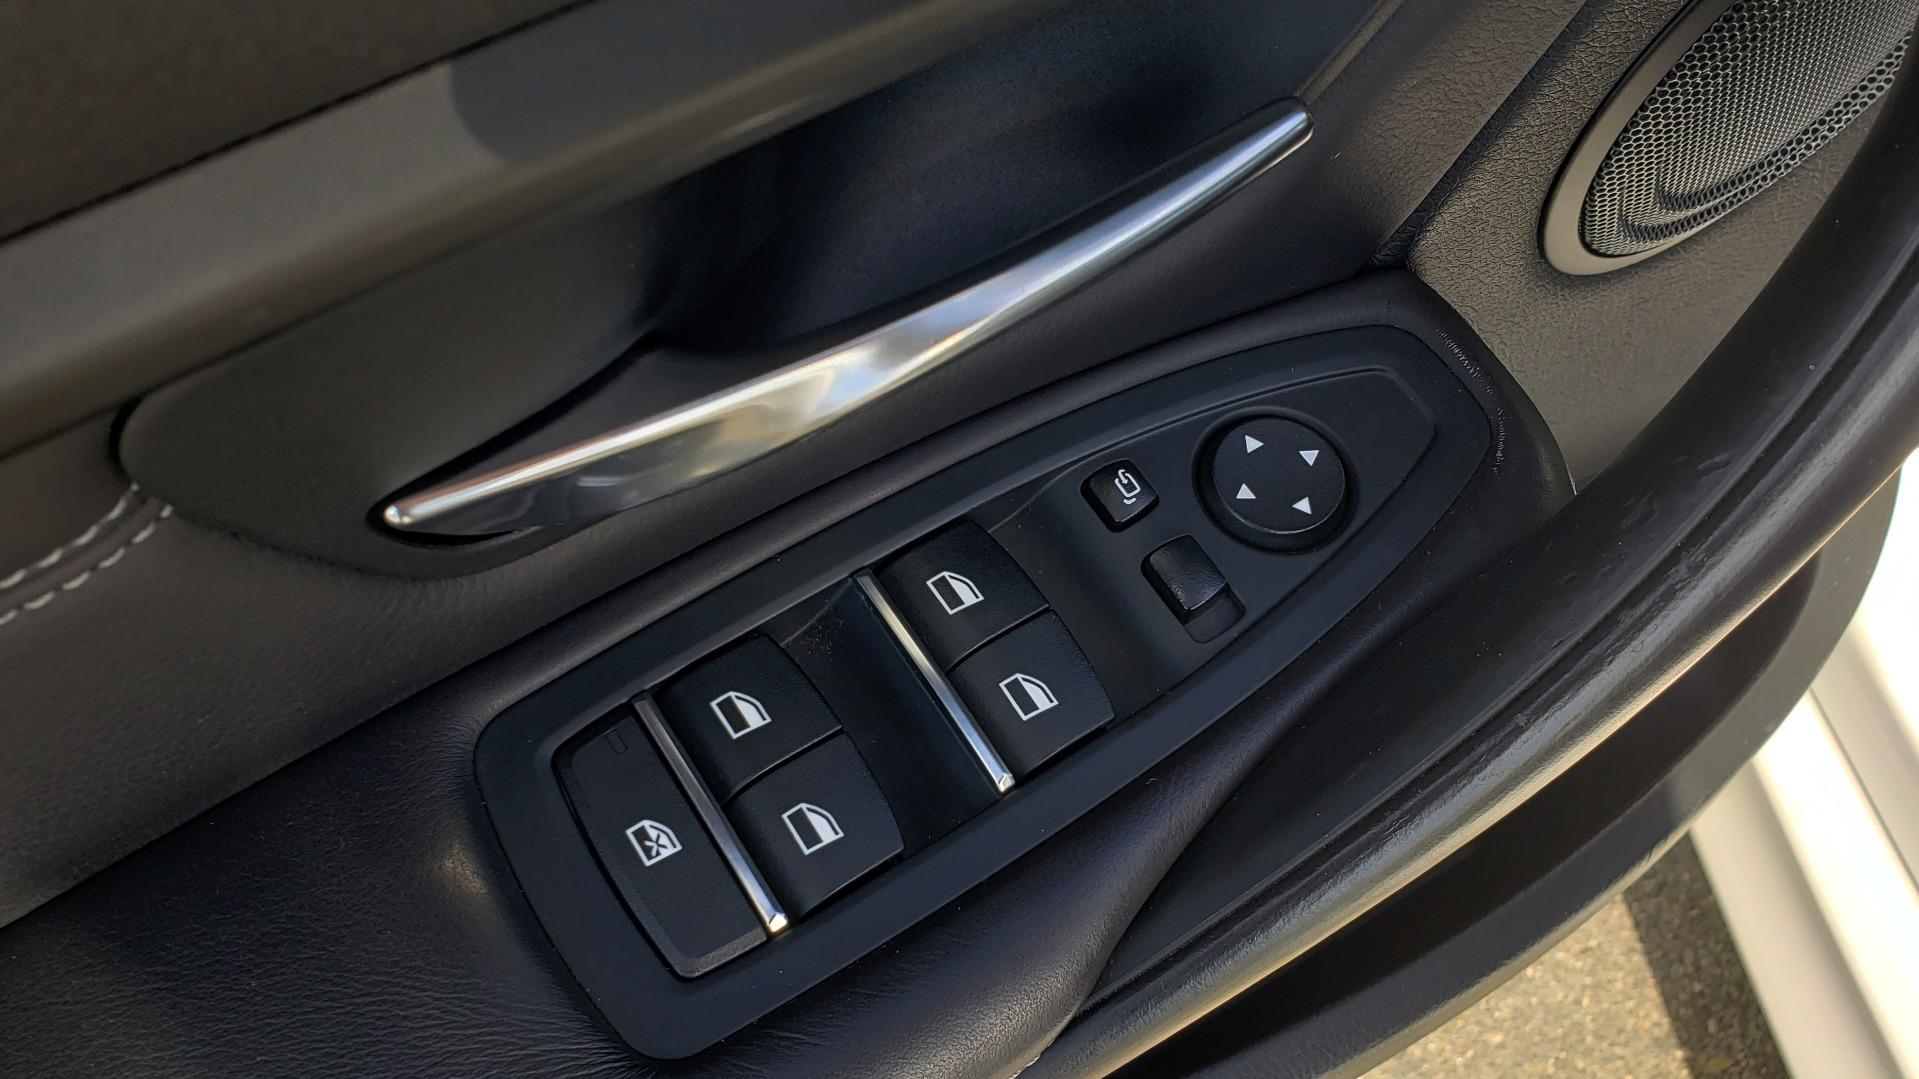 Used 2016 BMW M3 SEDAN / EXECUTIVE PKG / M-SUSPENSION / HARMAN/KARDON SOUND for sale Sold at Formula Imports in Charlotte NC 28227 36